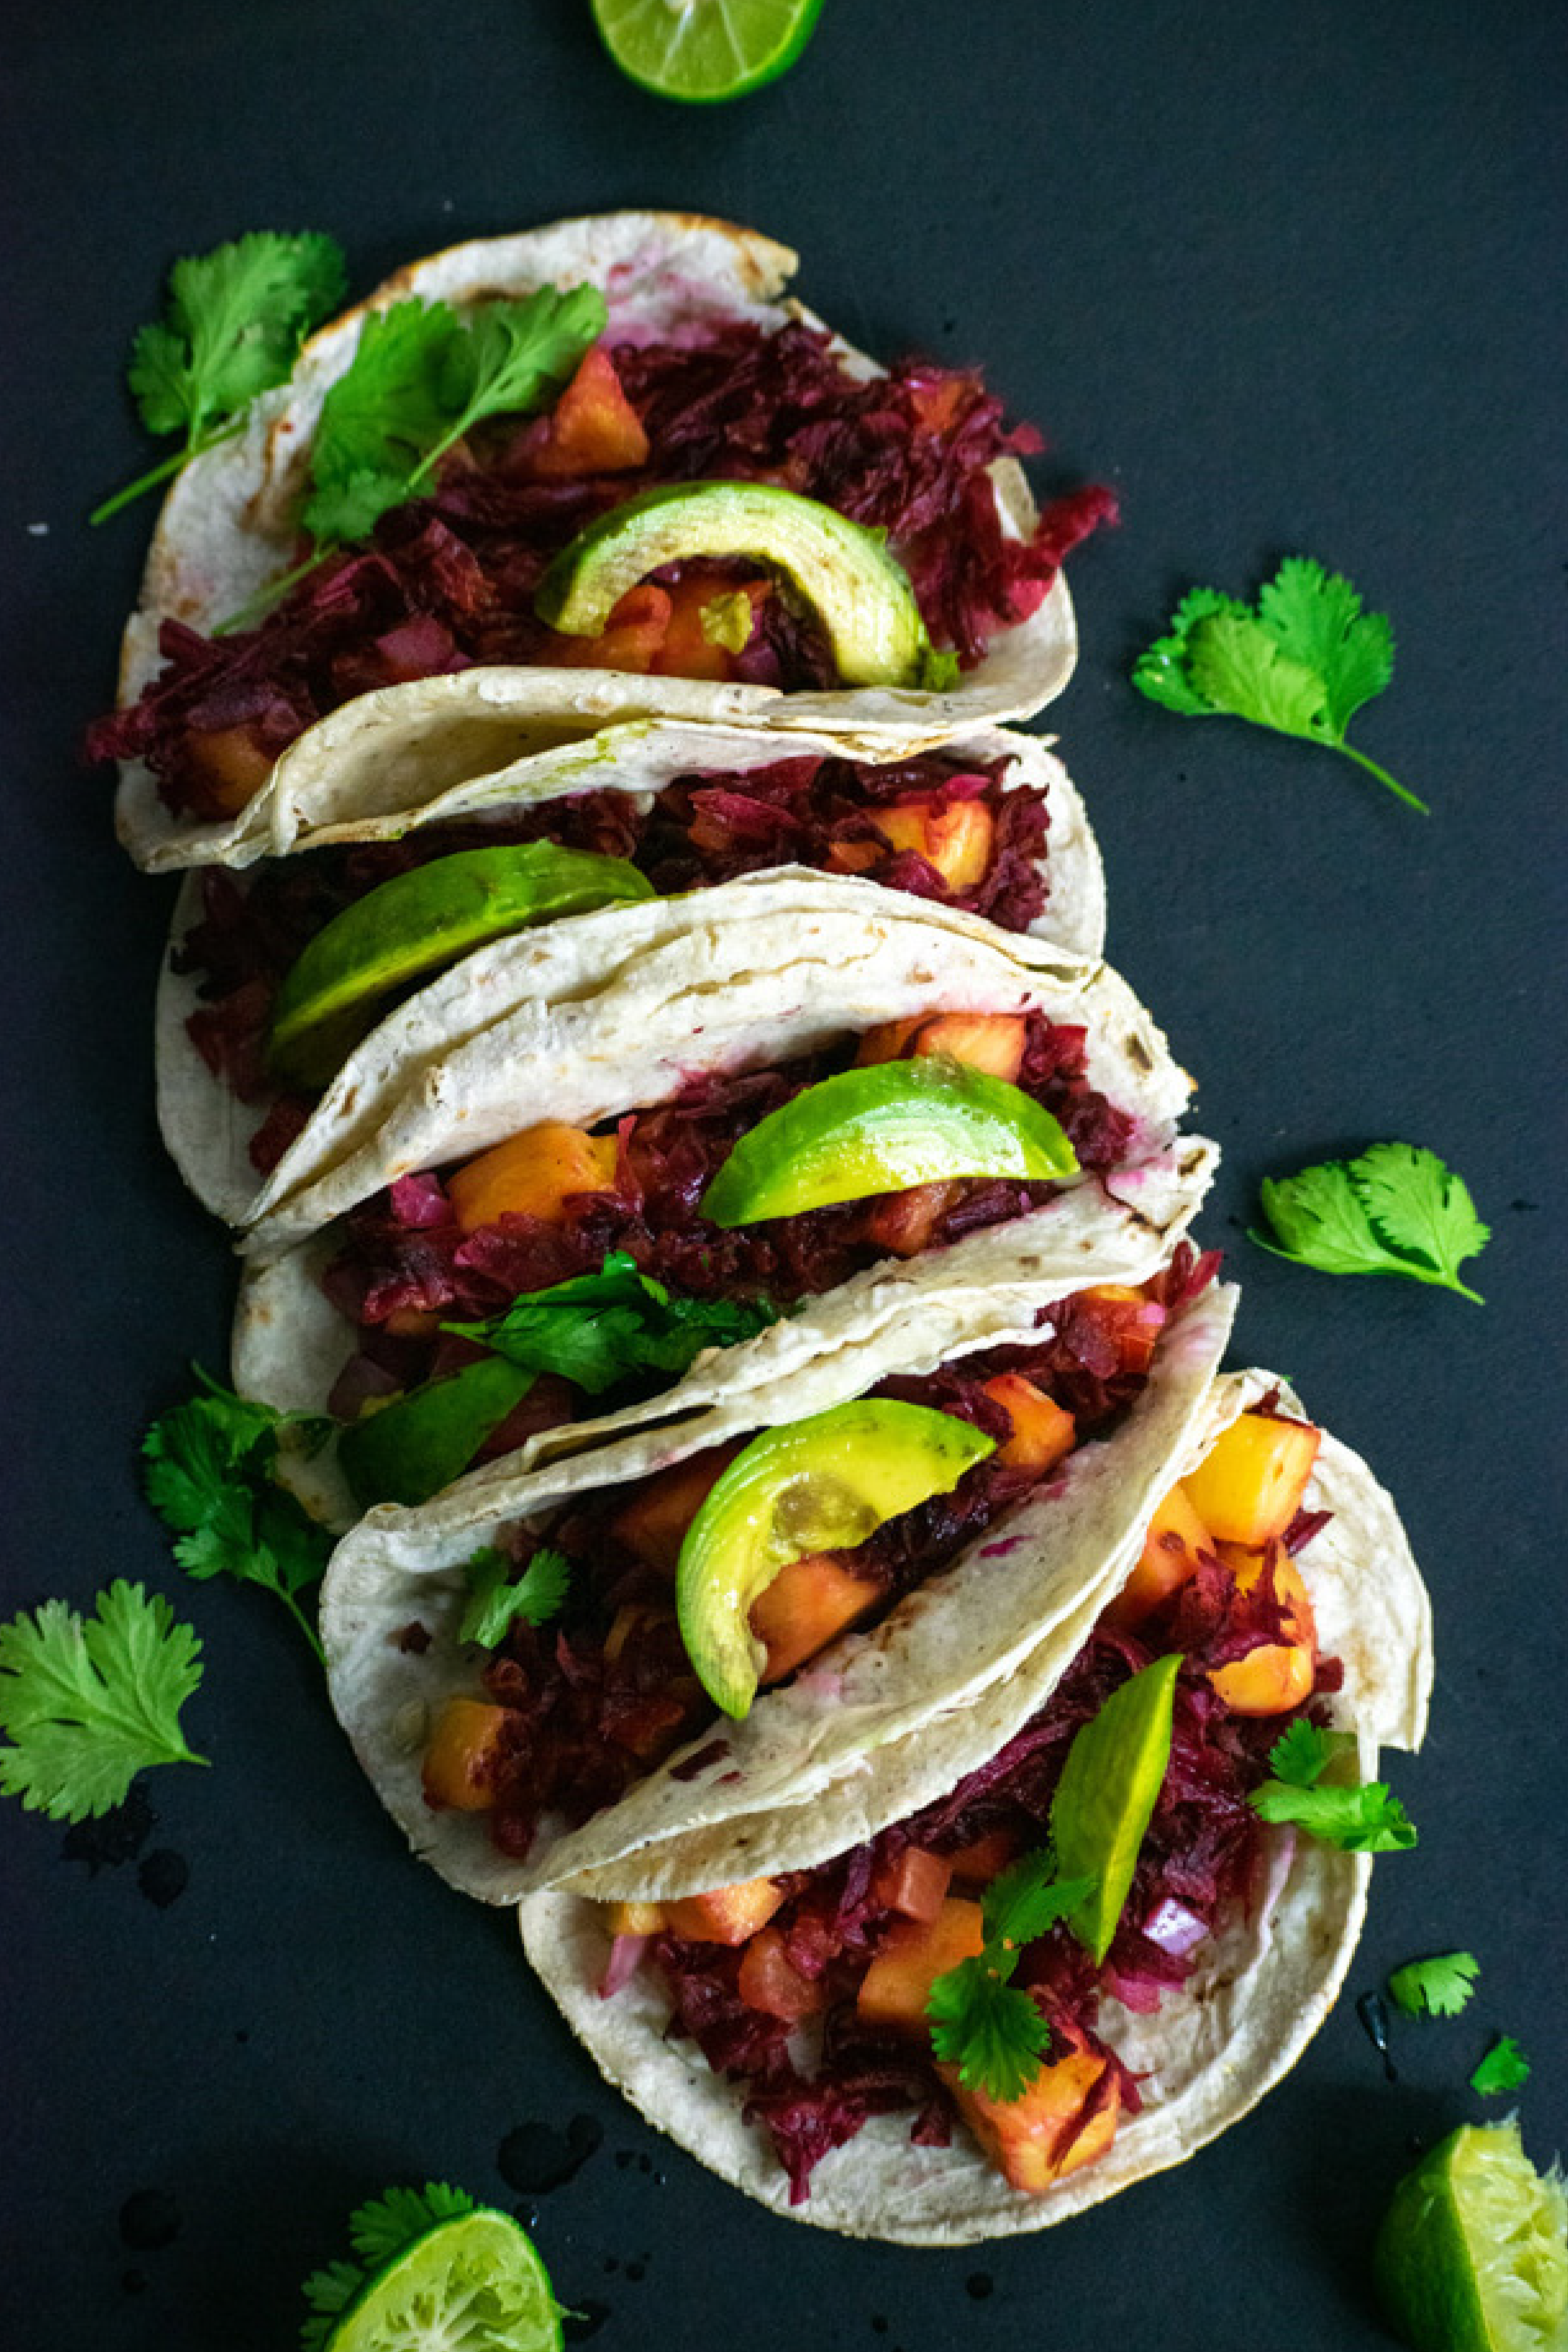 Hibiscus Tacos Tacos De Jamaica Recipe Vegan Fajitas Recipes Vegan Mexican